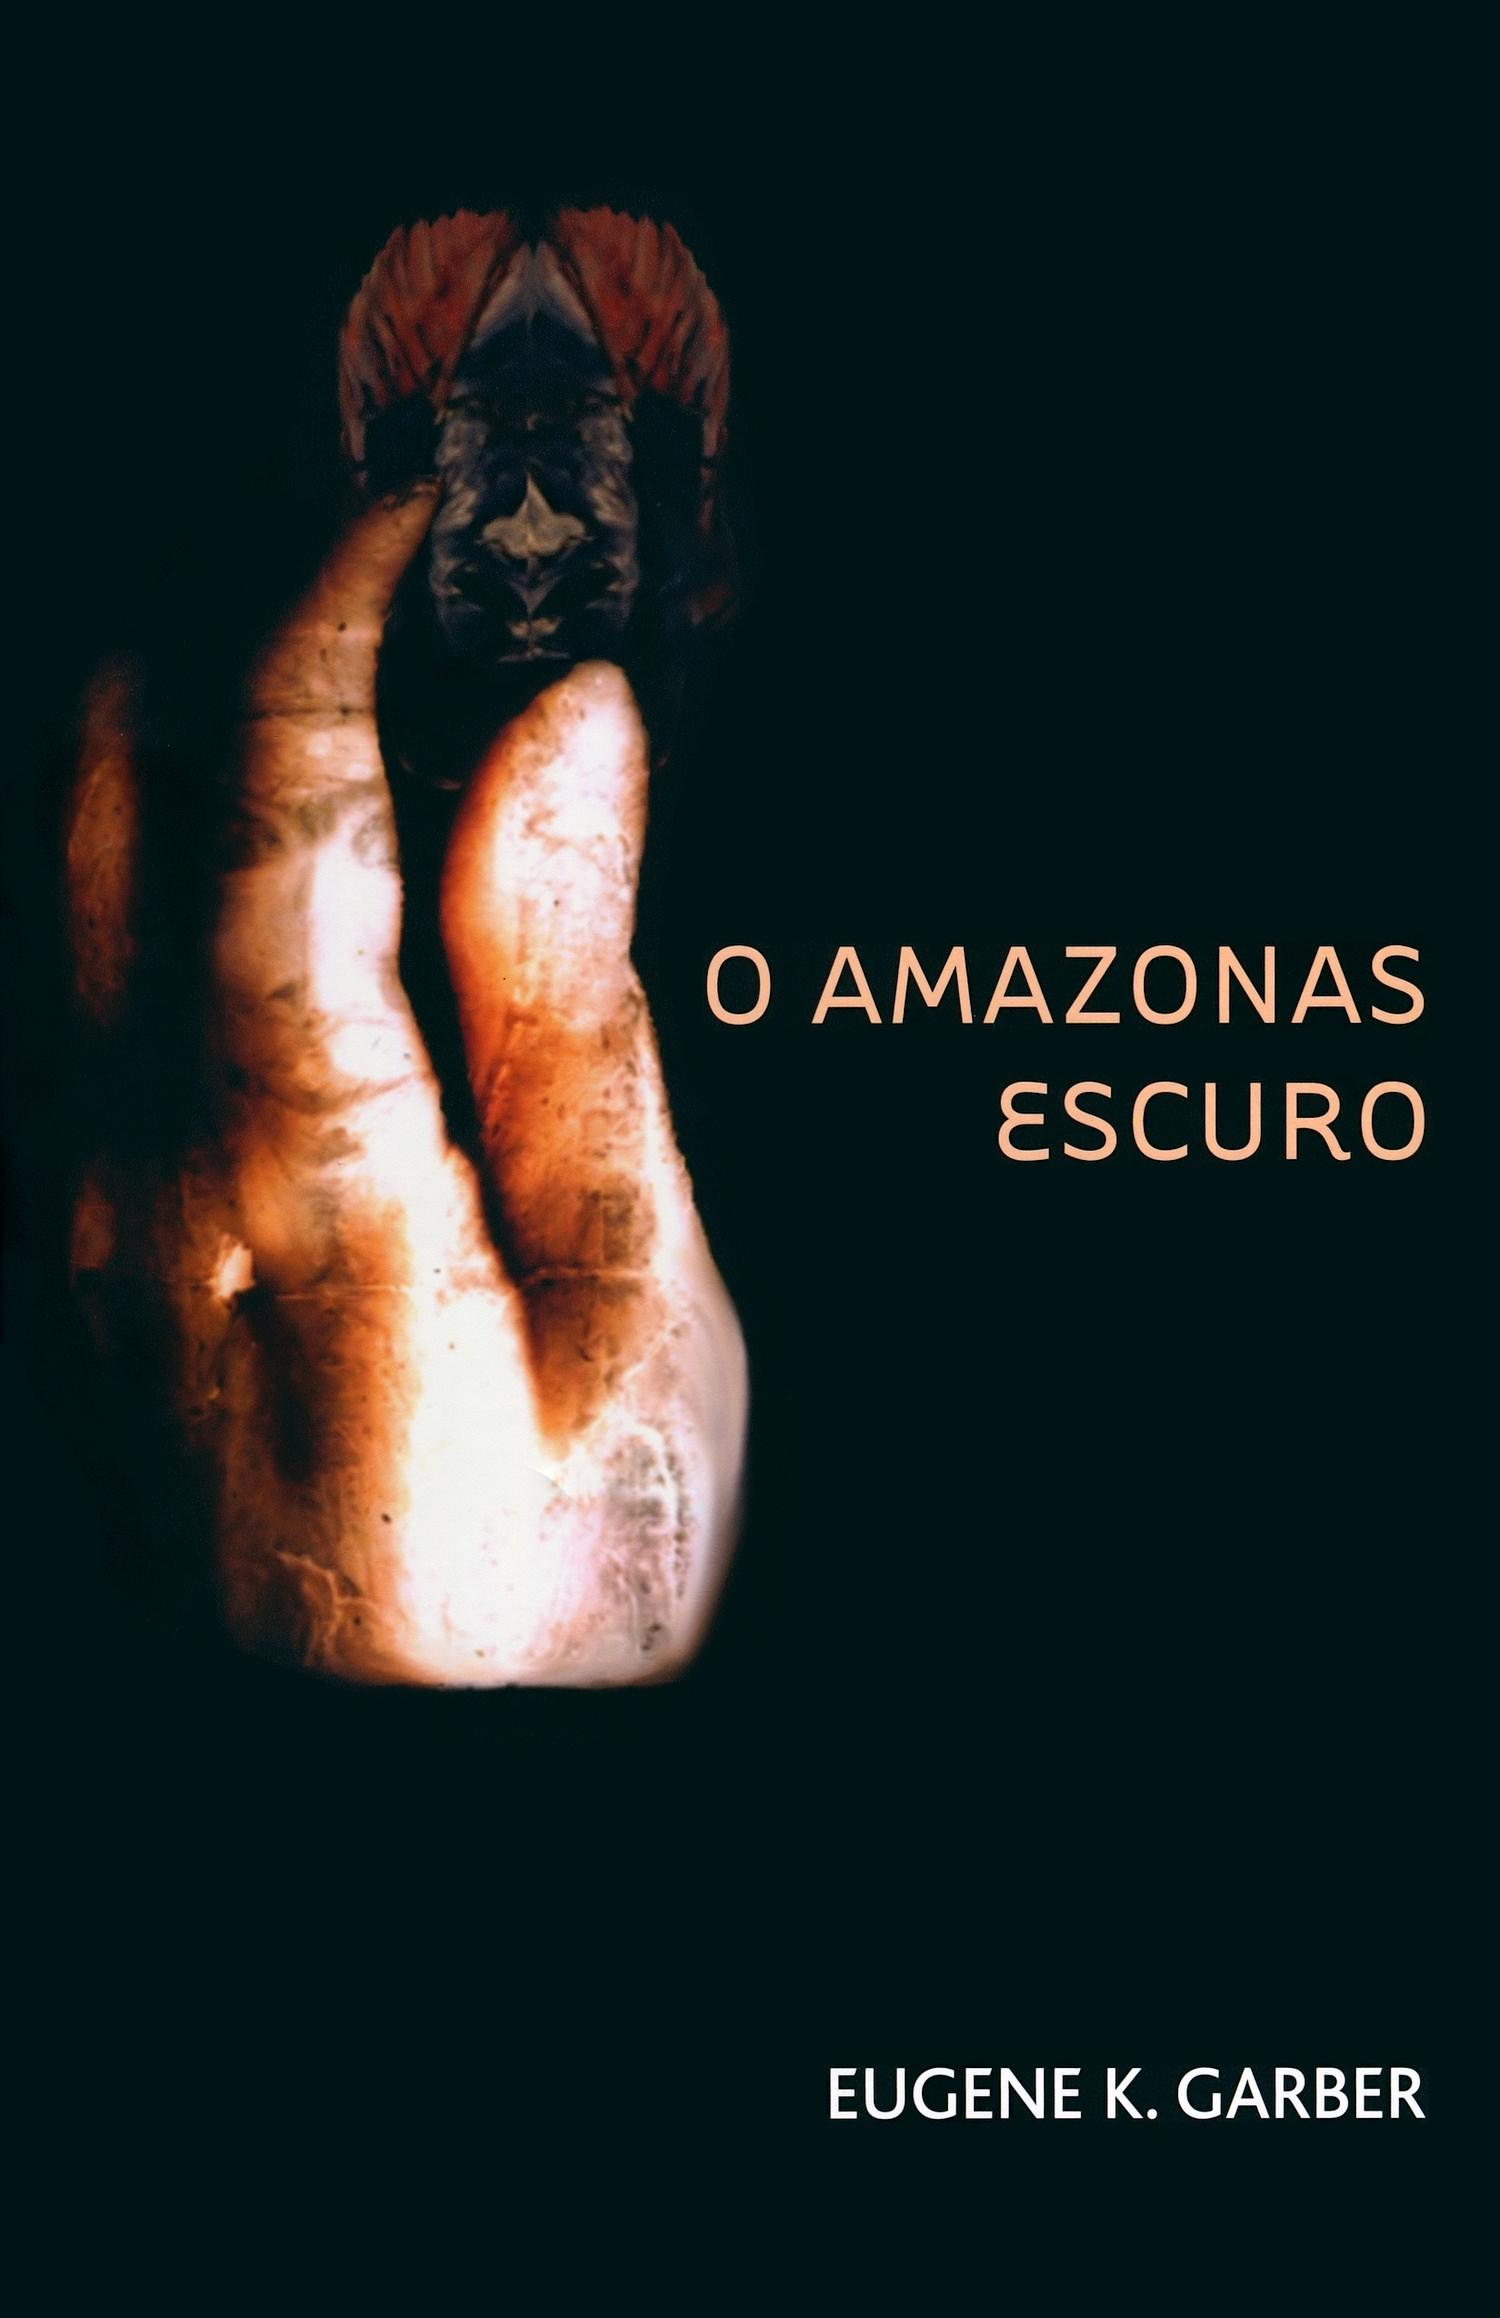 Amazonas - cover 5.5x8.5, 1500w.jpeg